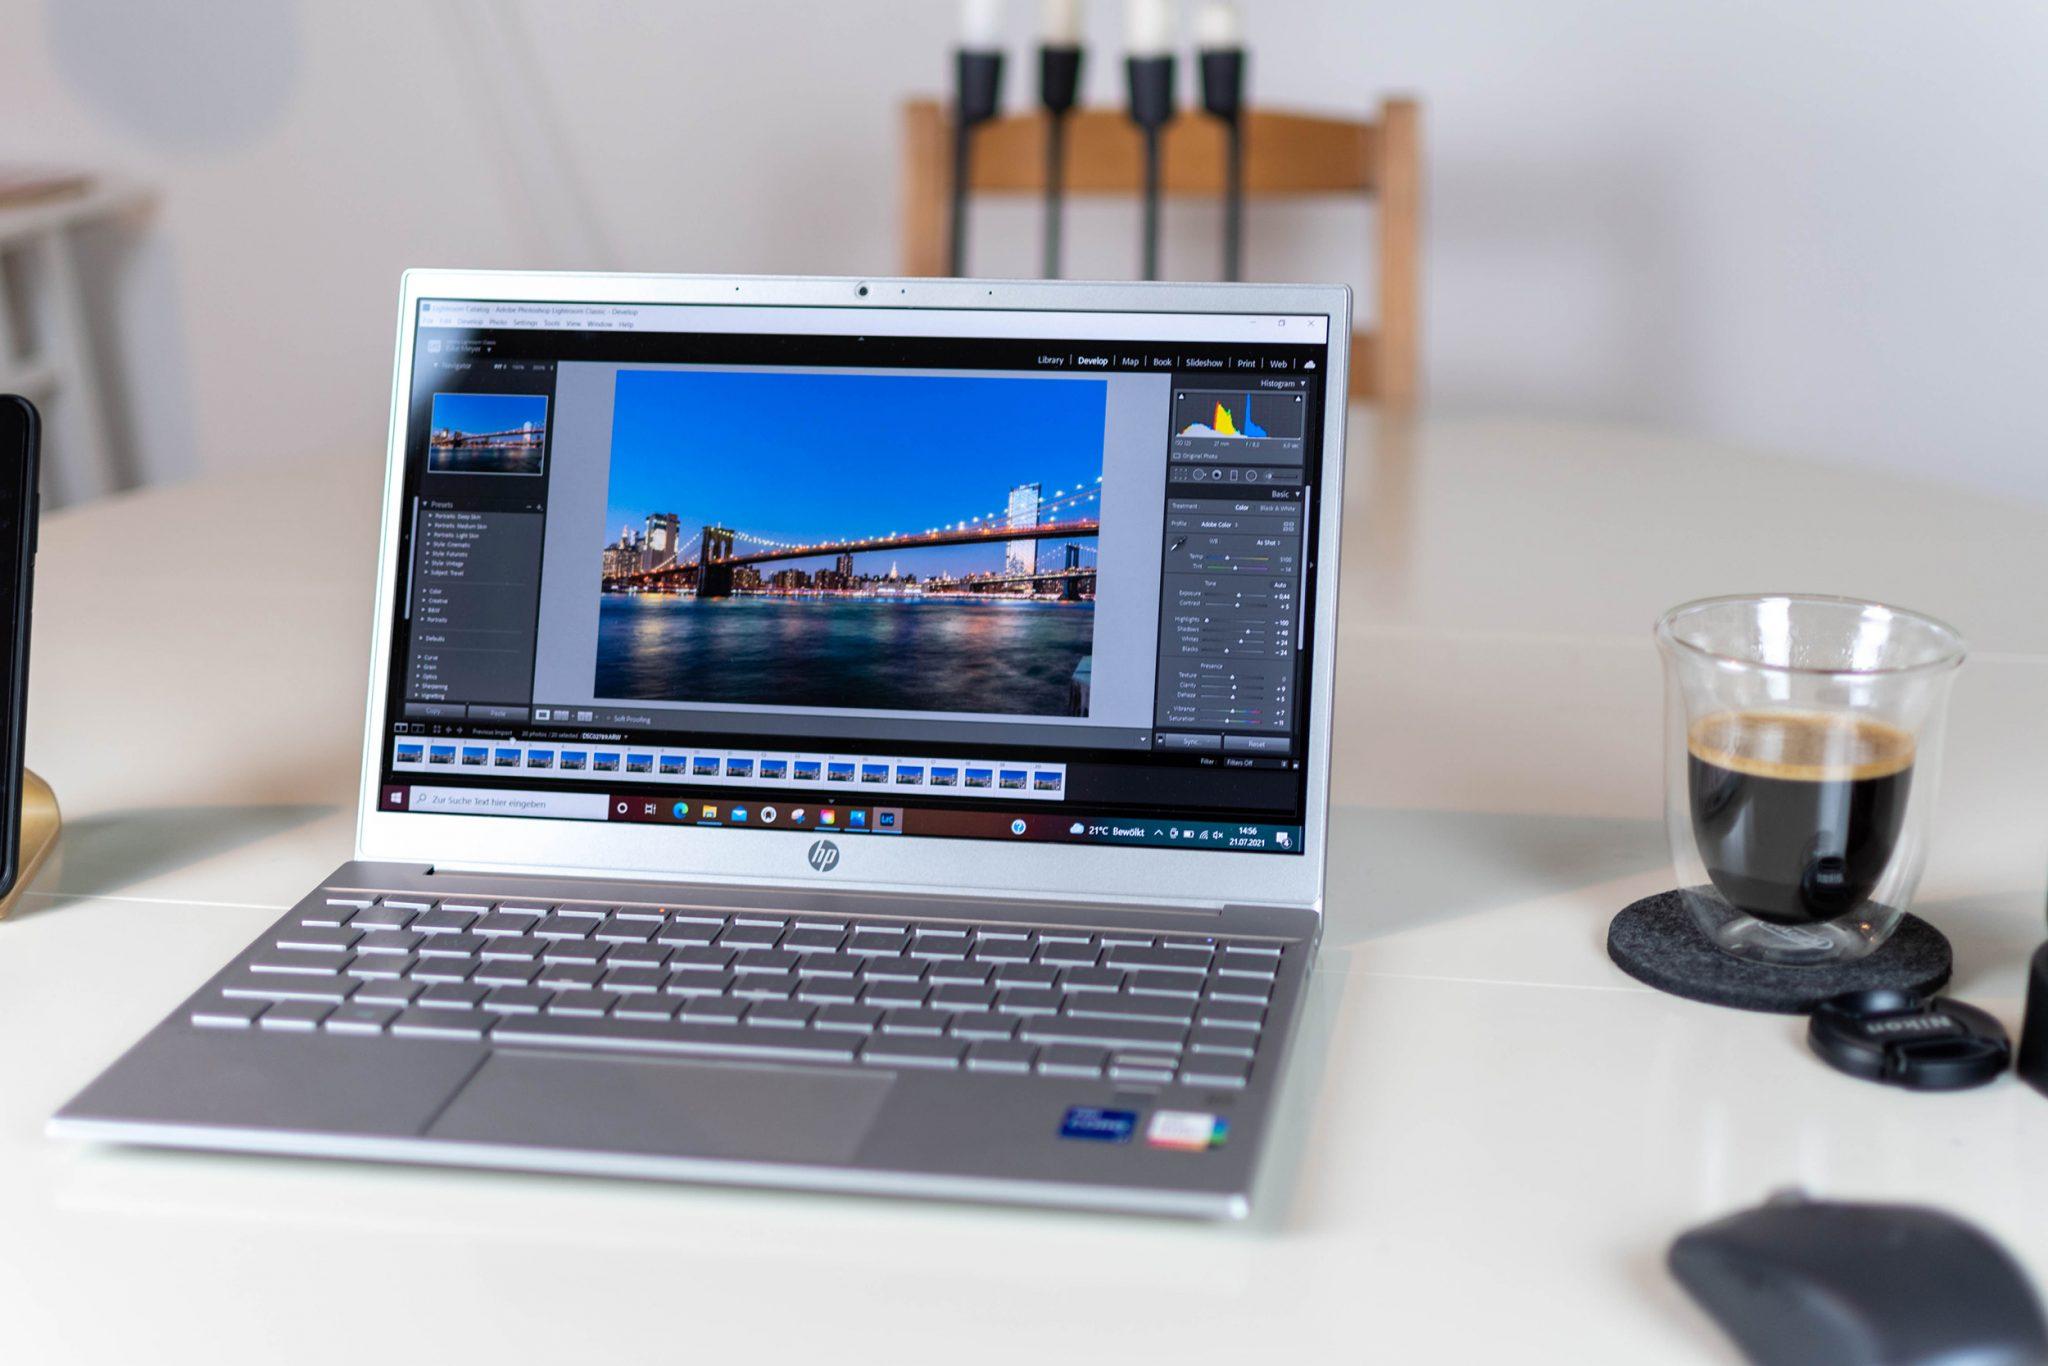 HP Pavilion 13 im Test - kompaktes Allround-Notebook